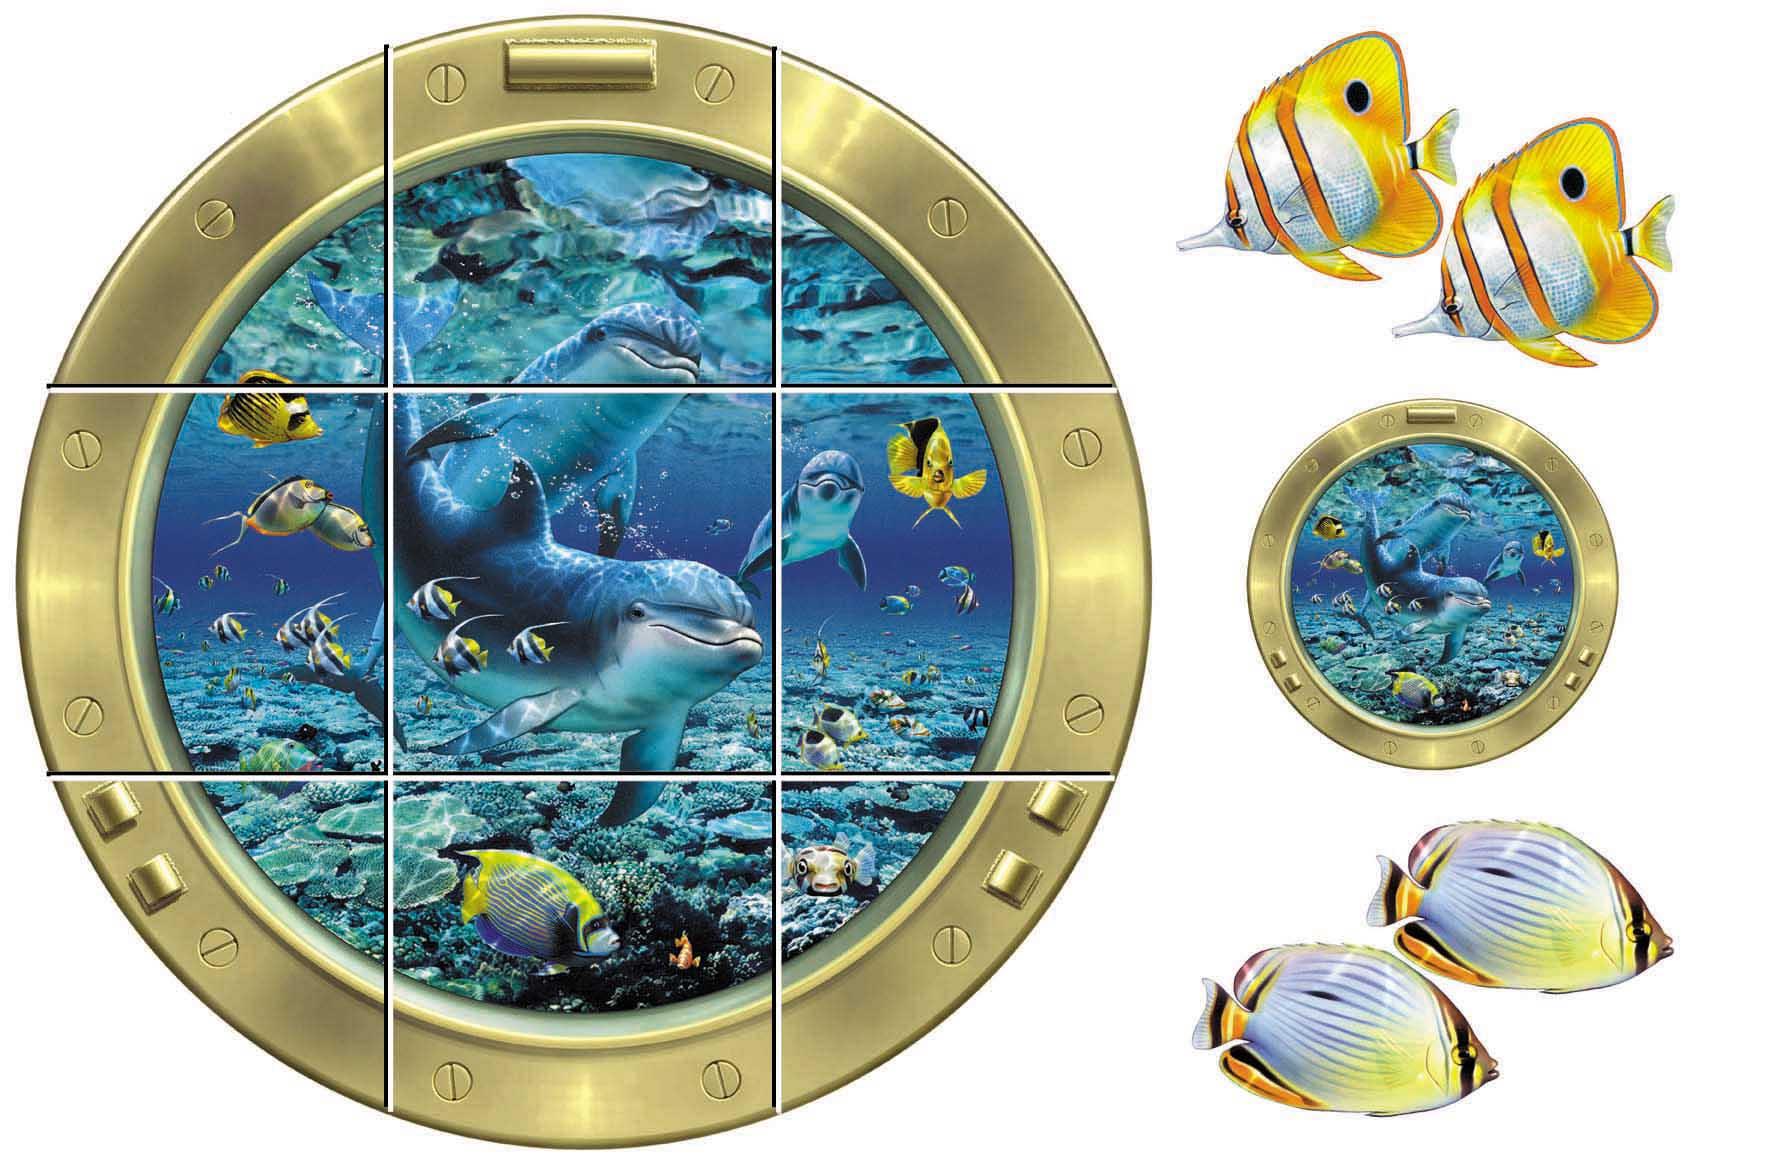 IdeaStix Coral Pals 9-Piece Tile Mural - Original Premium Peel and Stick D??cor